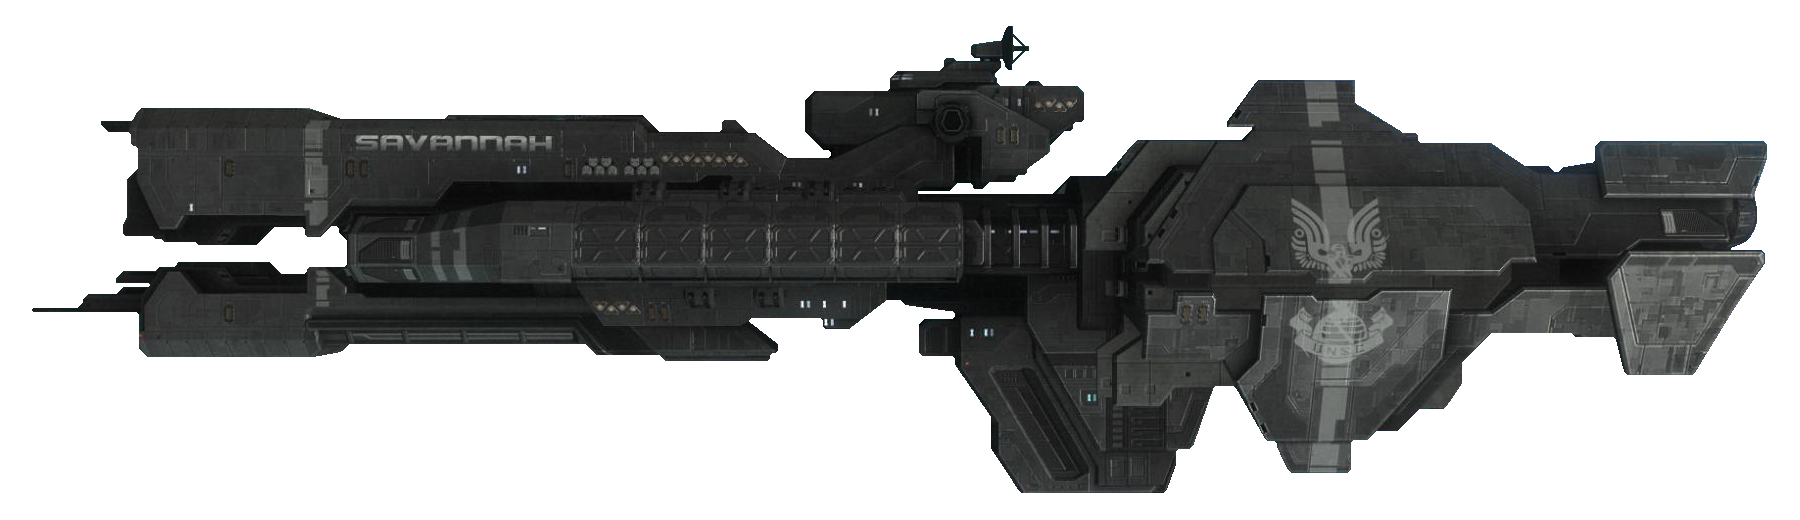 UNSC Savannah - Halo Nation — The Halo encyclopedia - Halo 1, Halo 2 ...